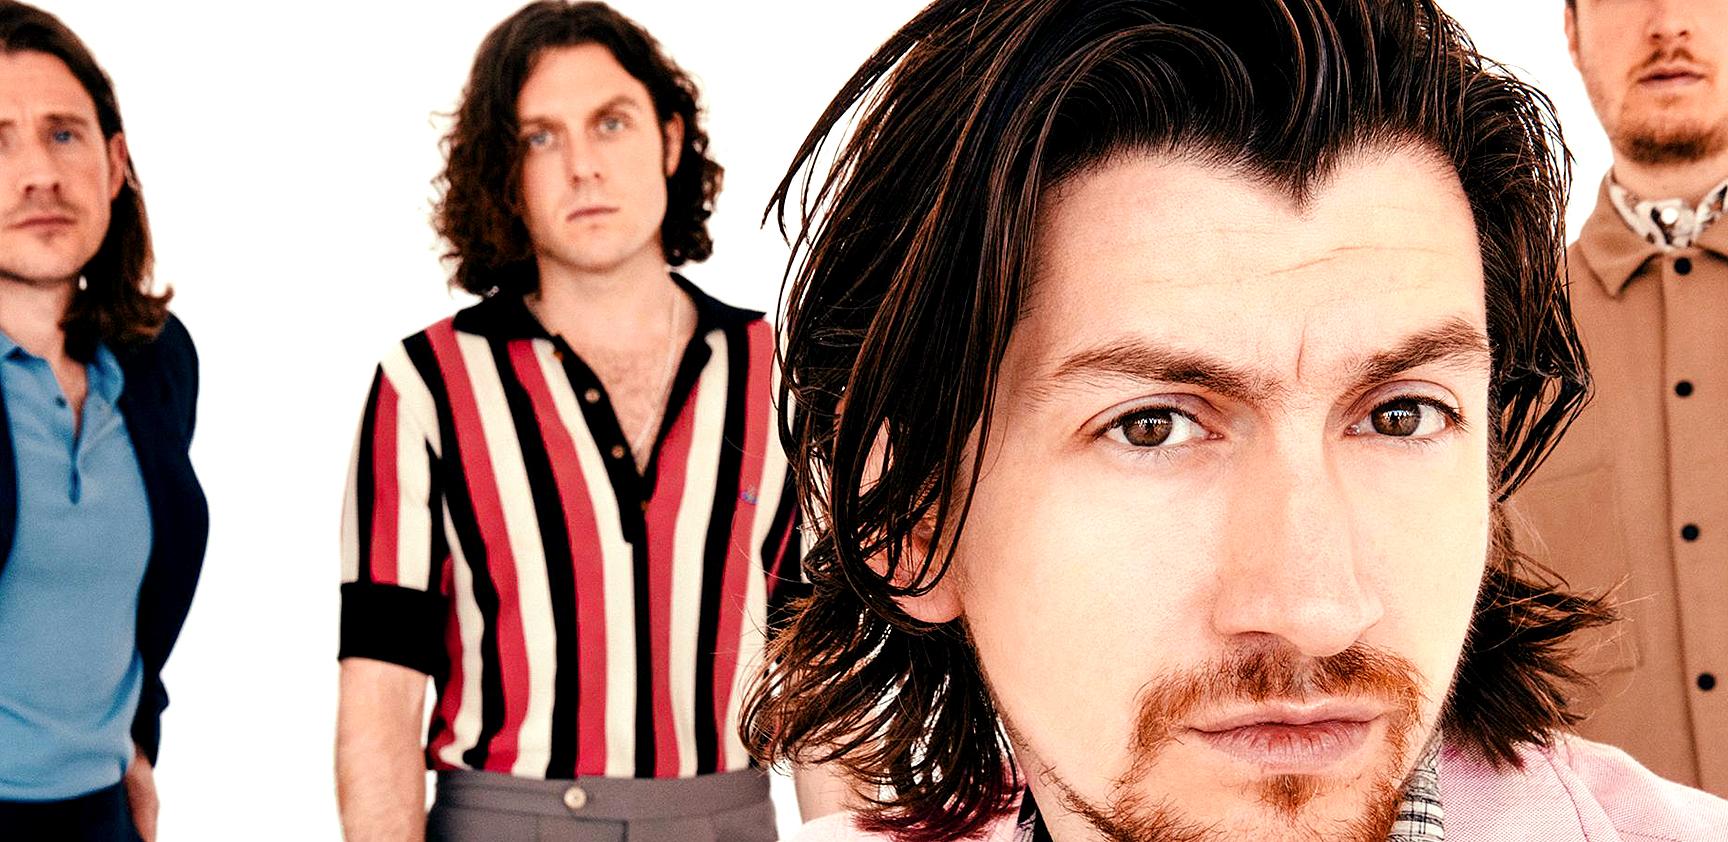 Arctic Monkeys - Live at Reading-Leeds - 2014 - BBC Radio 1